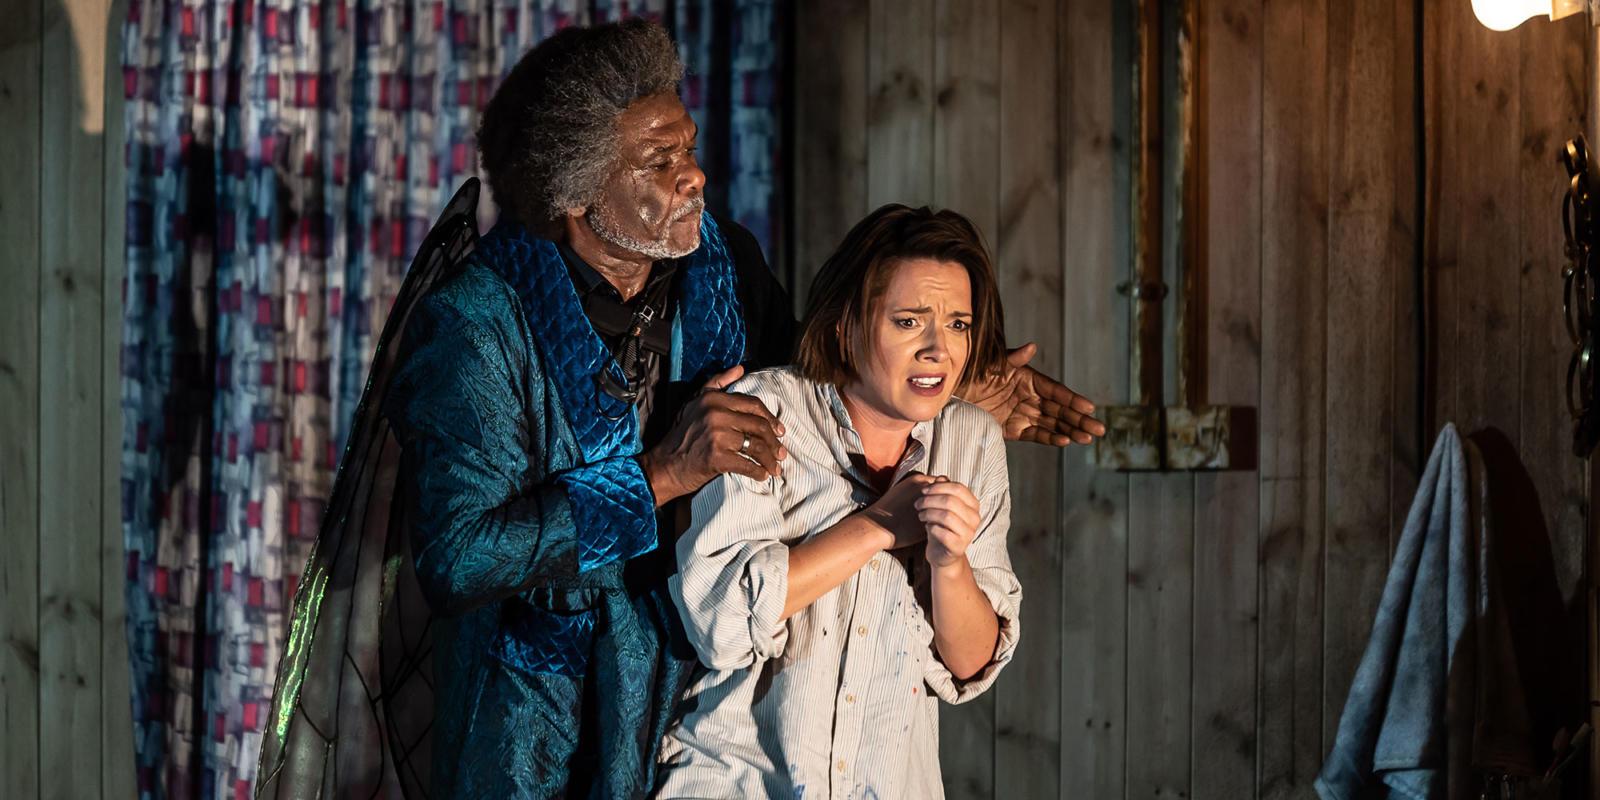 ENO1920 Orpheus in the Underworld: Mary Bevan as Eurydice and Willard White as Jupiter